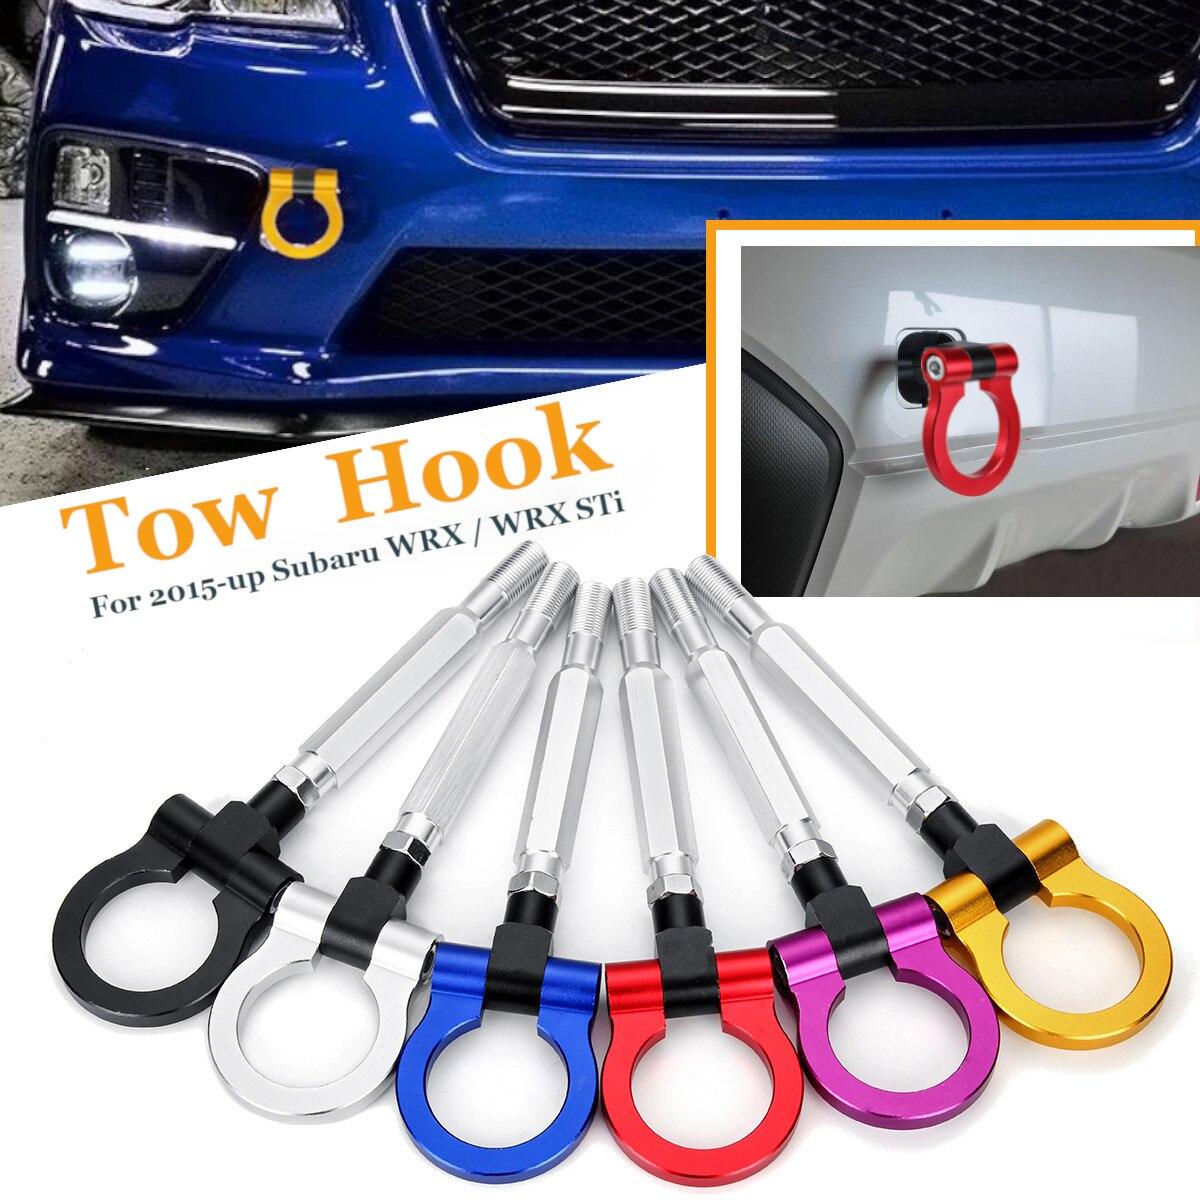 Universal Car Tow Towing Hook Ring Racing Aluminum Front Rear for Subaru WRX STI BRZ 2015-upUniversal Car Tow Towing Hook Ring Racing Aluminum Front Rear for Subaru WRX STI BRZ 2015-up